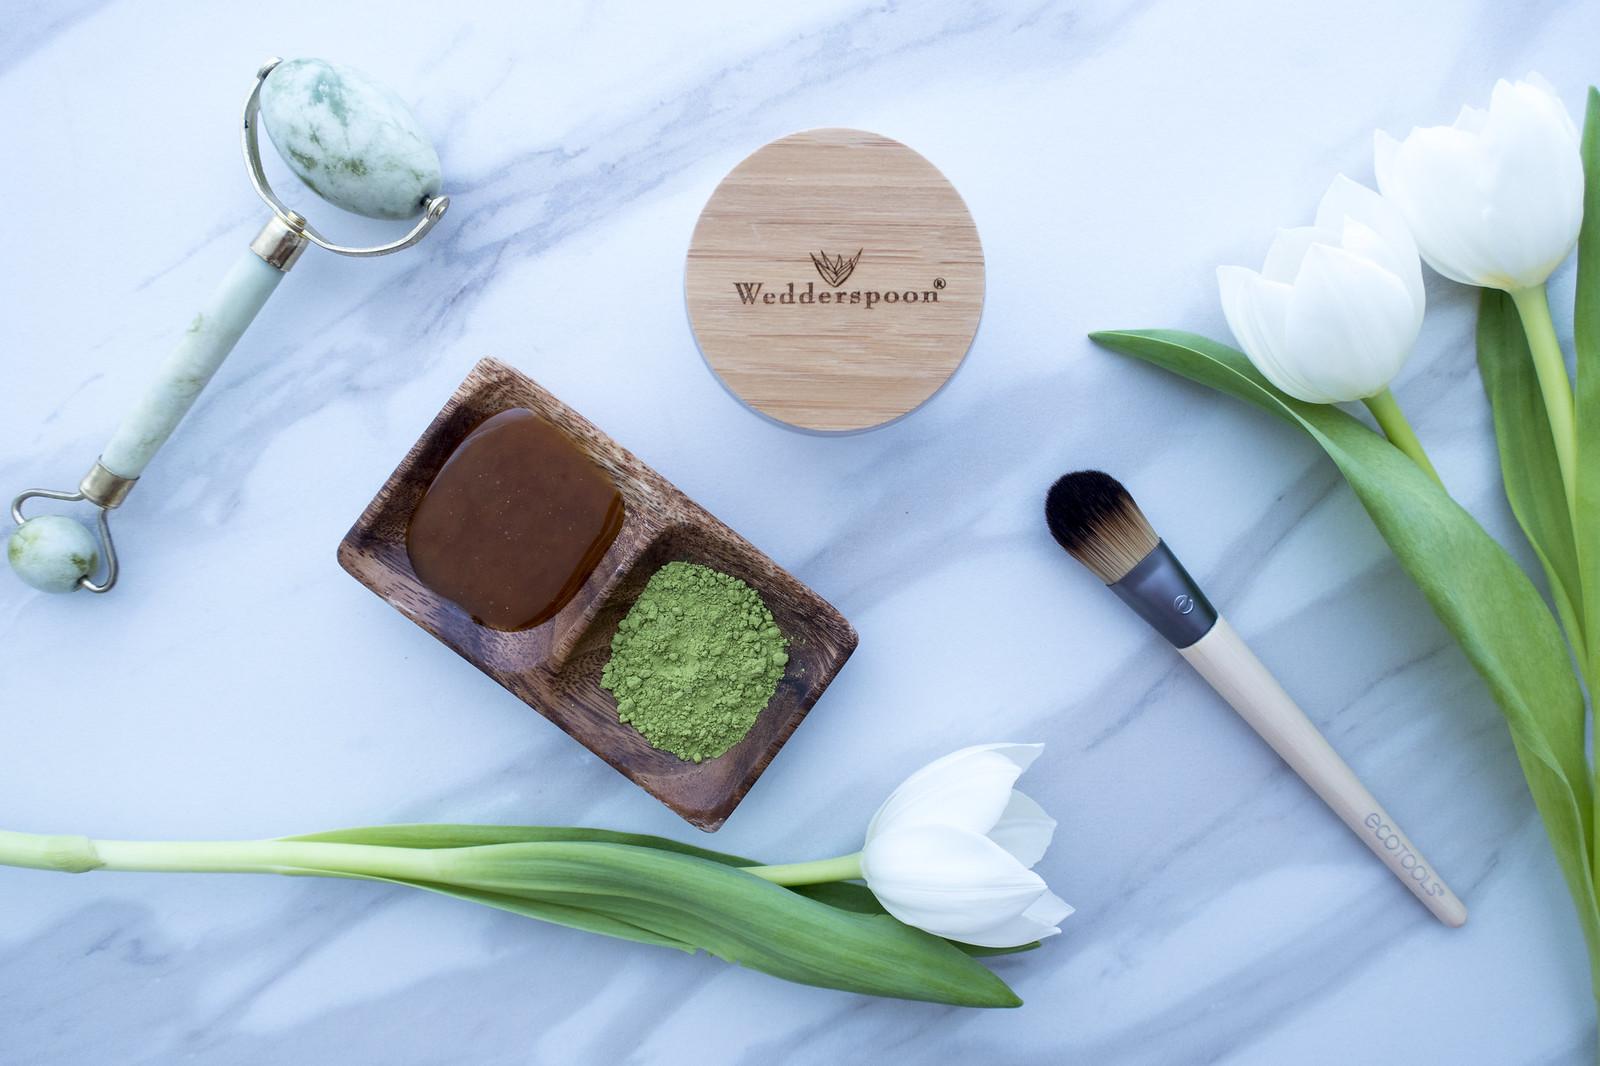 Organic Wedderspoon Jade Roller Honey Mask Nightcream